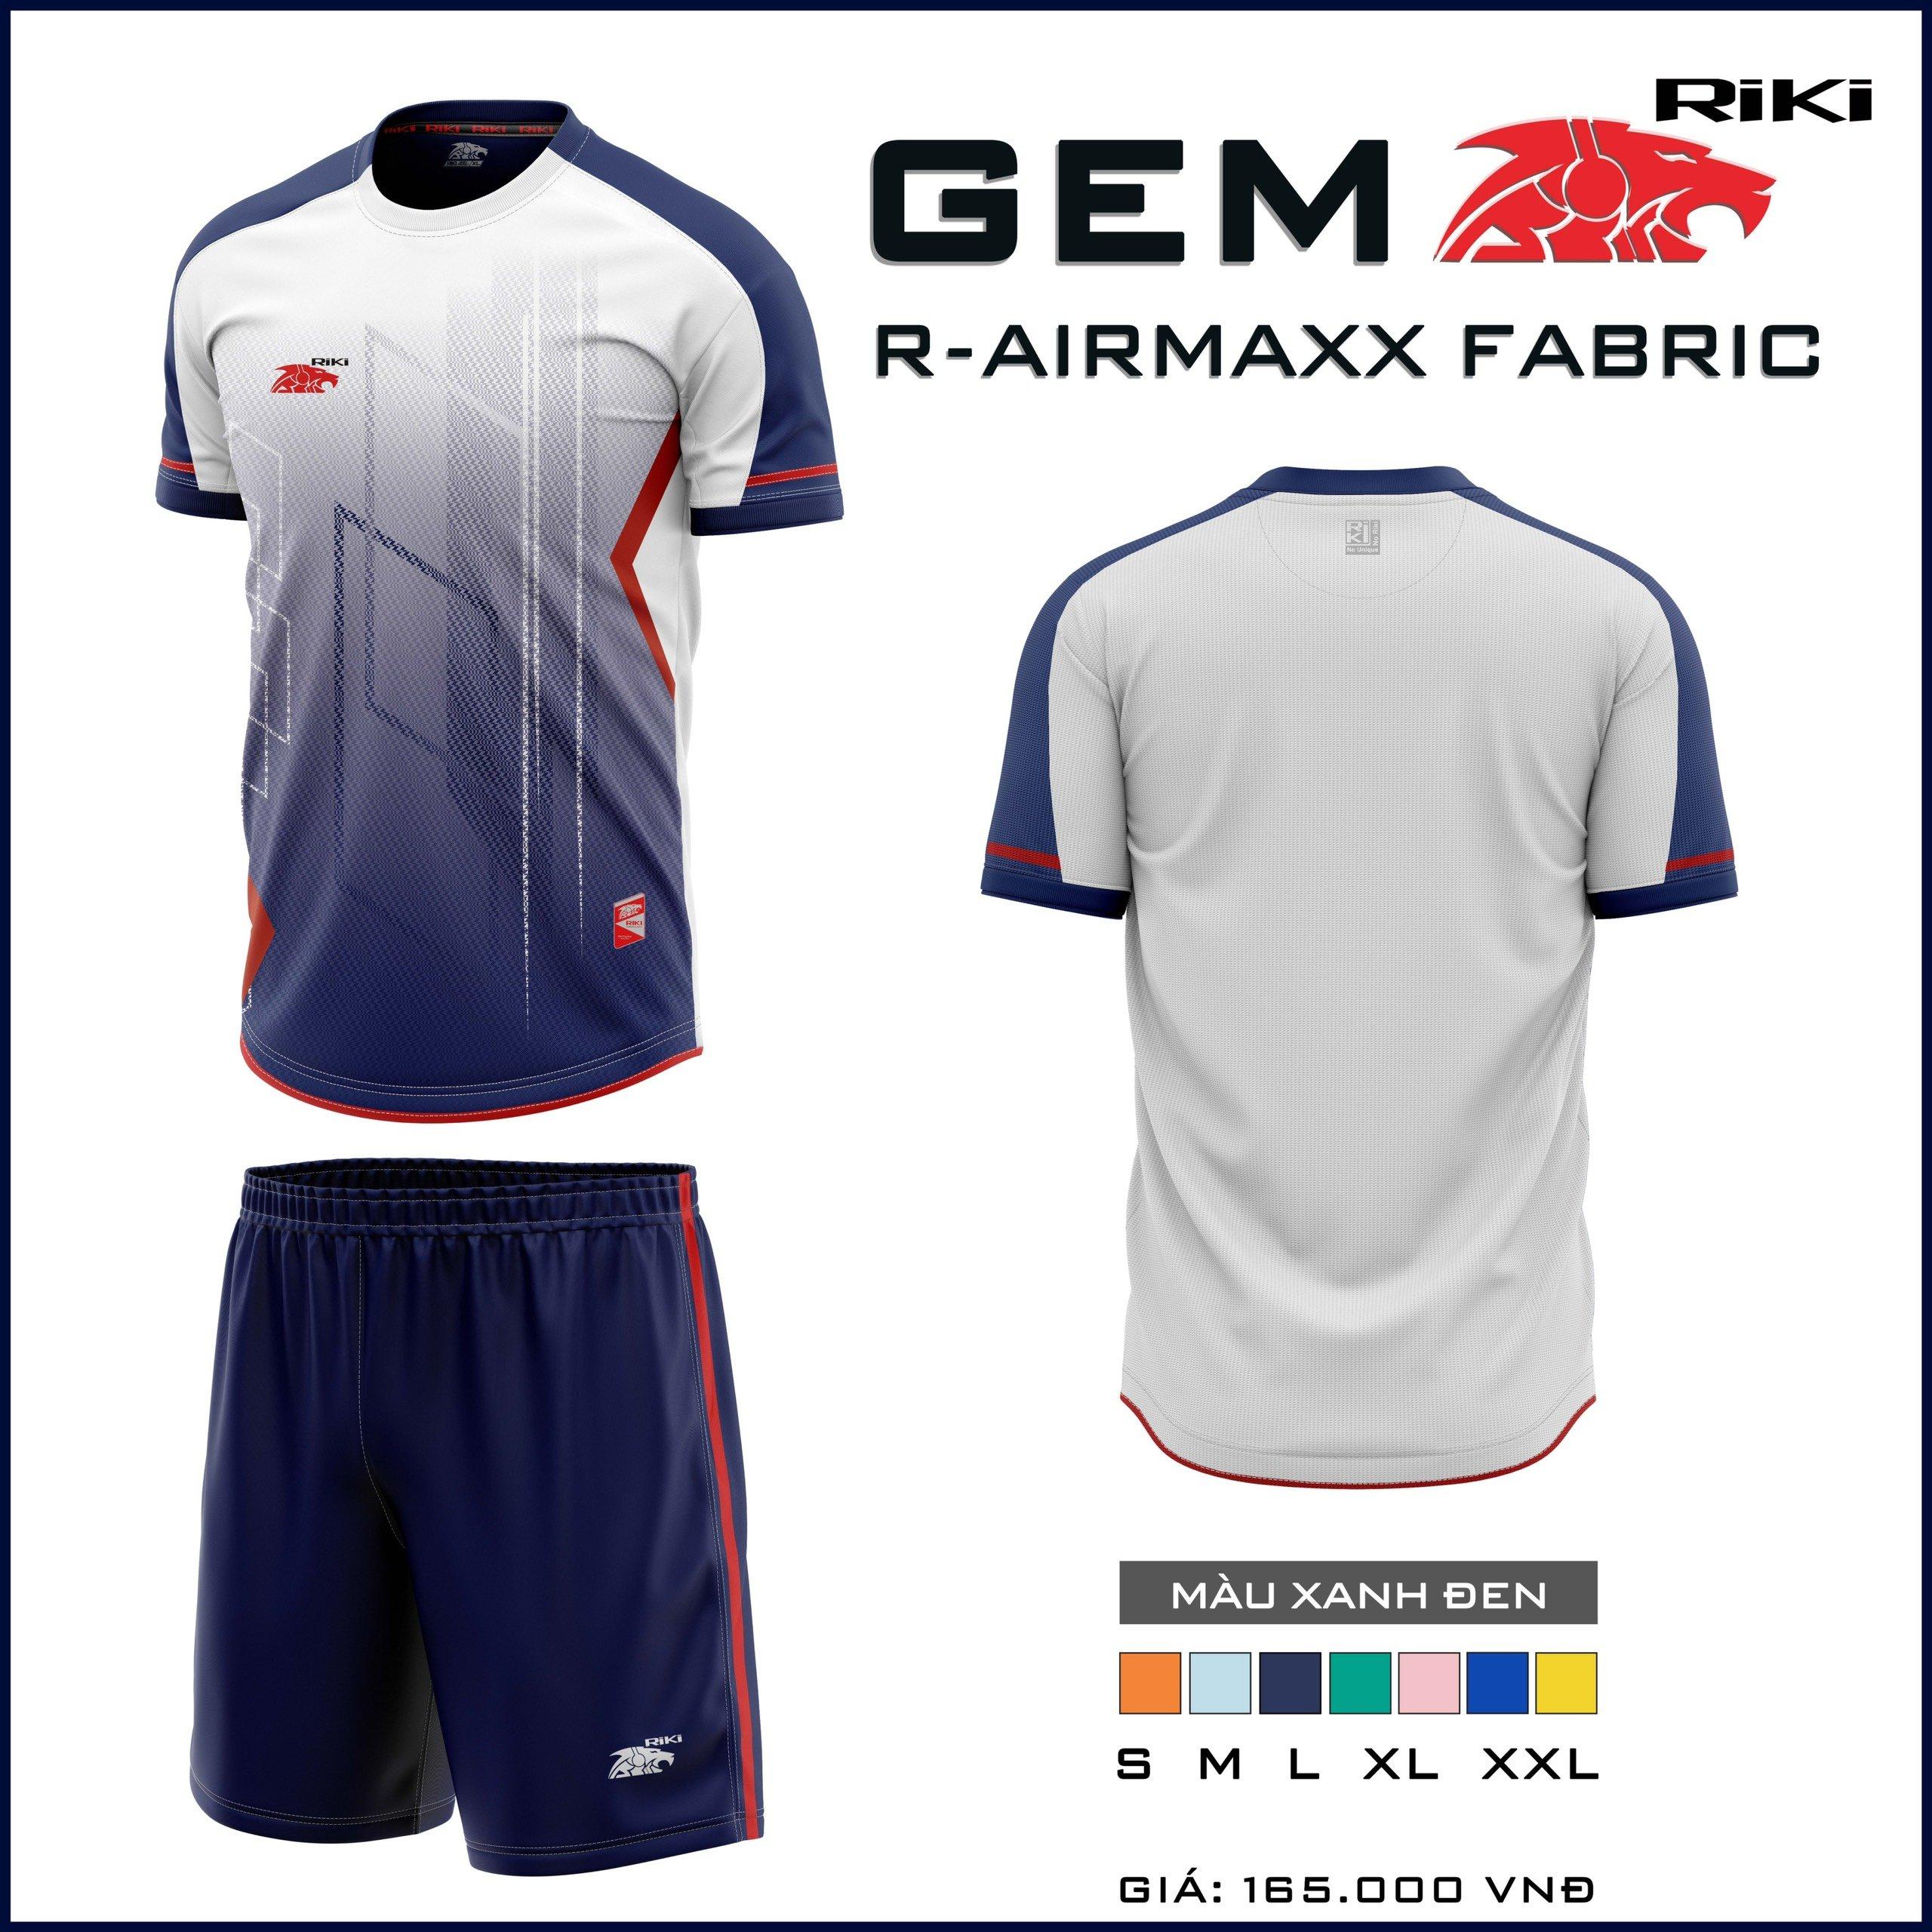 Quần áo bóng đá RIKI GEM